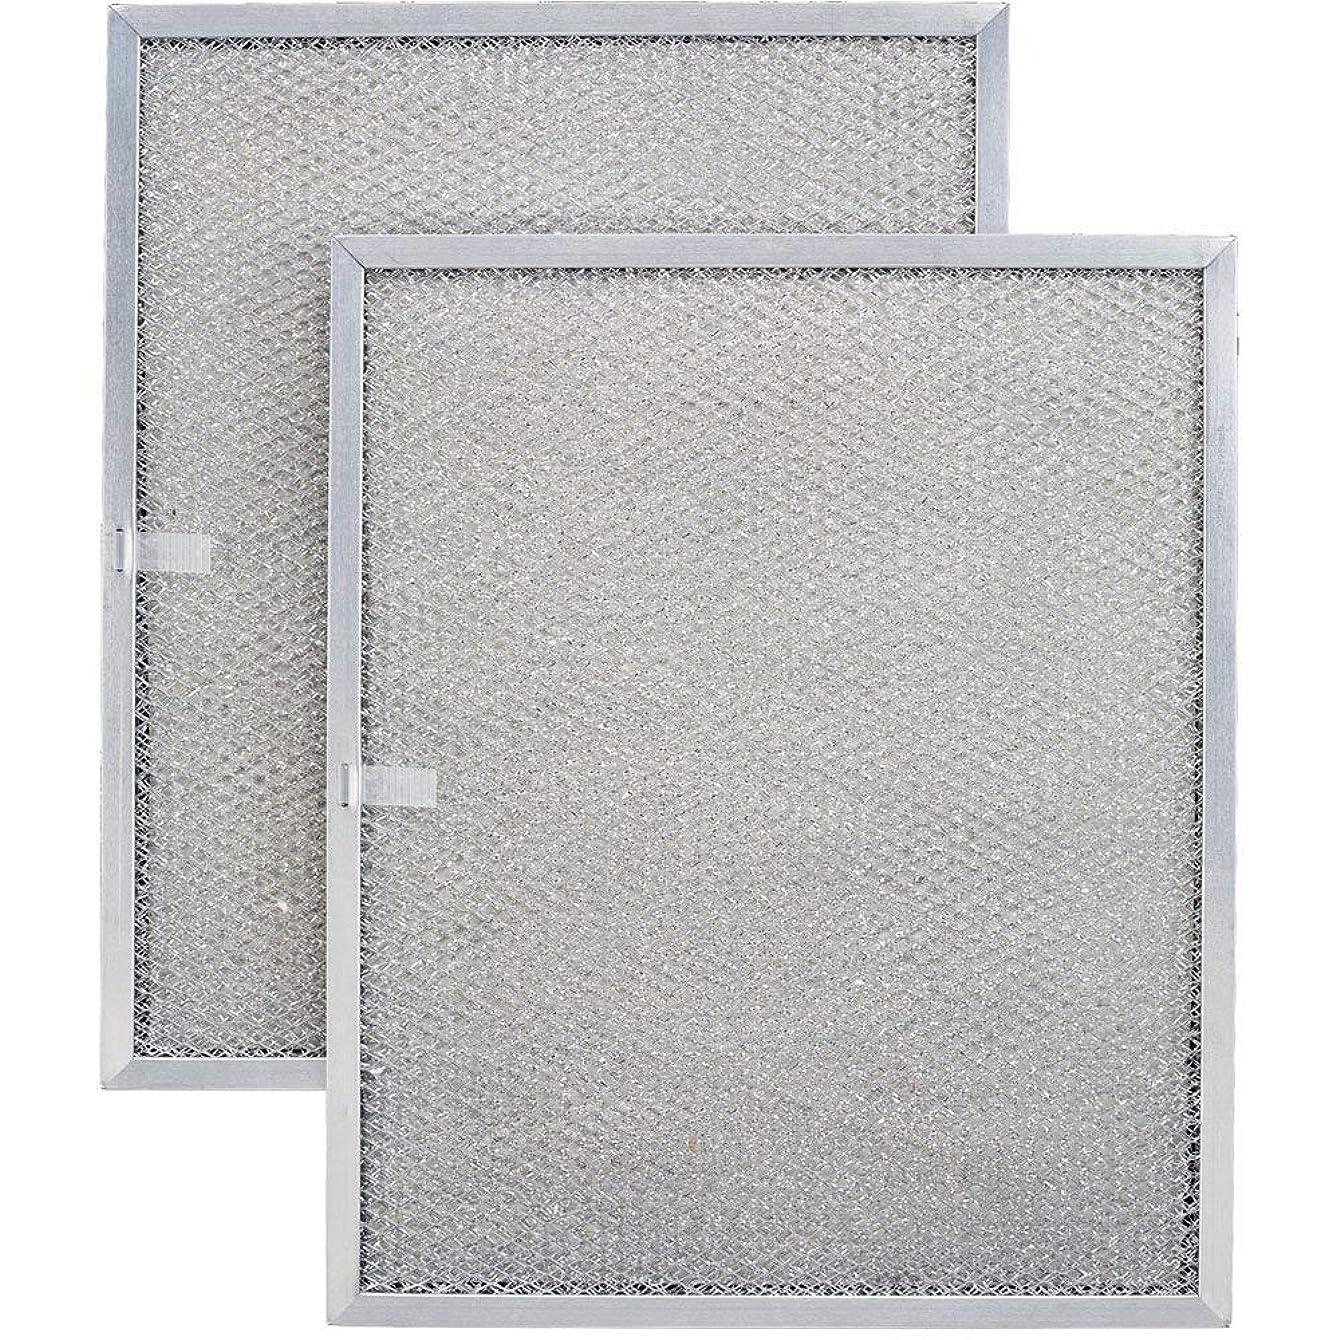 Aluminum Replacement Range Filter - Dimensions: 8-1/2 x 11-1/4 x 3/8-2 Pack